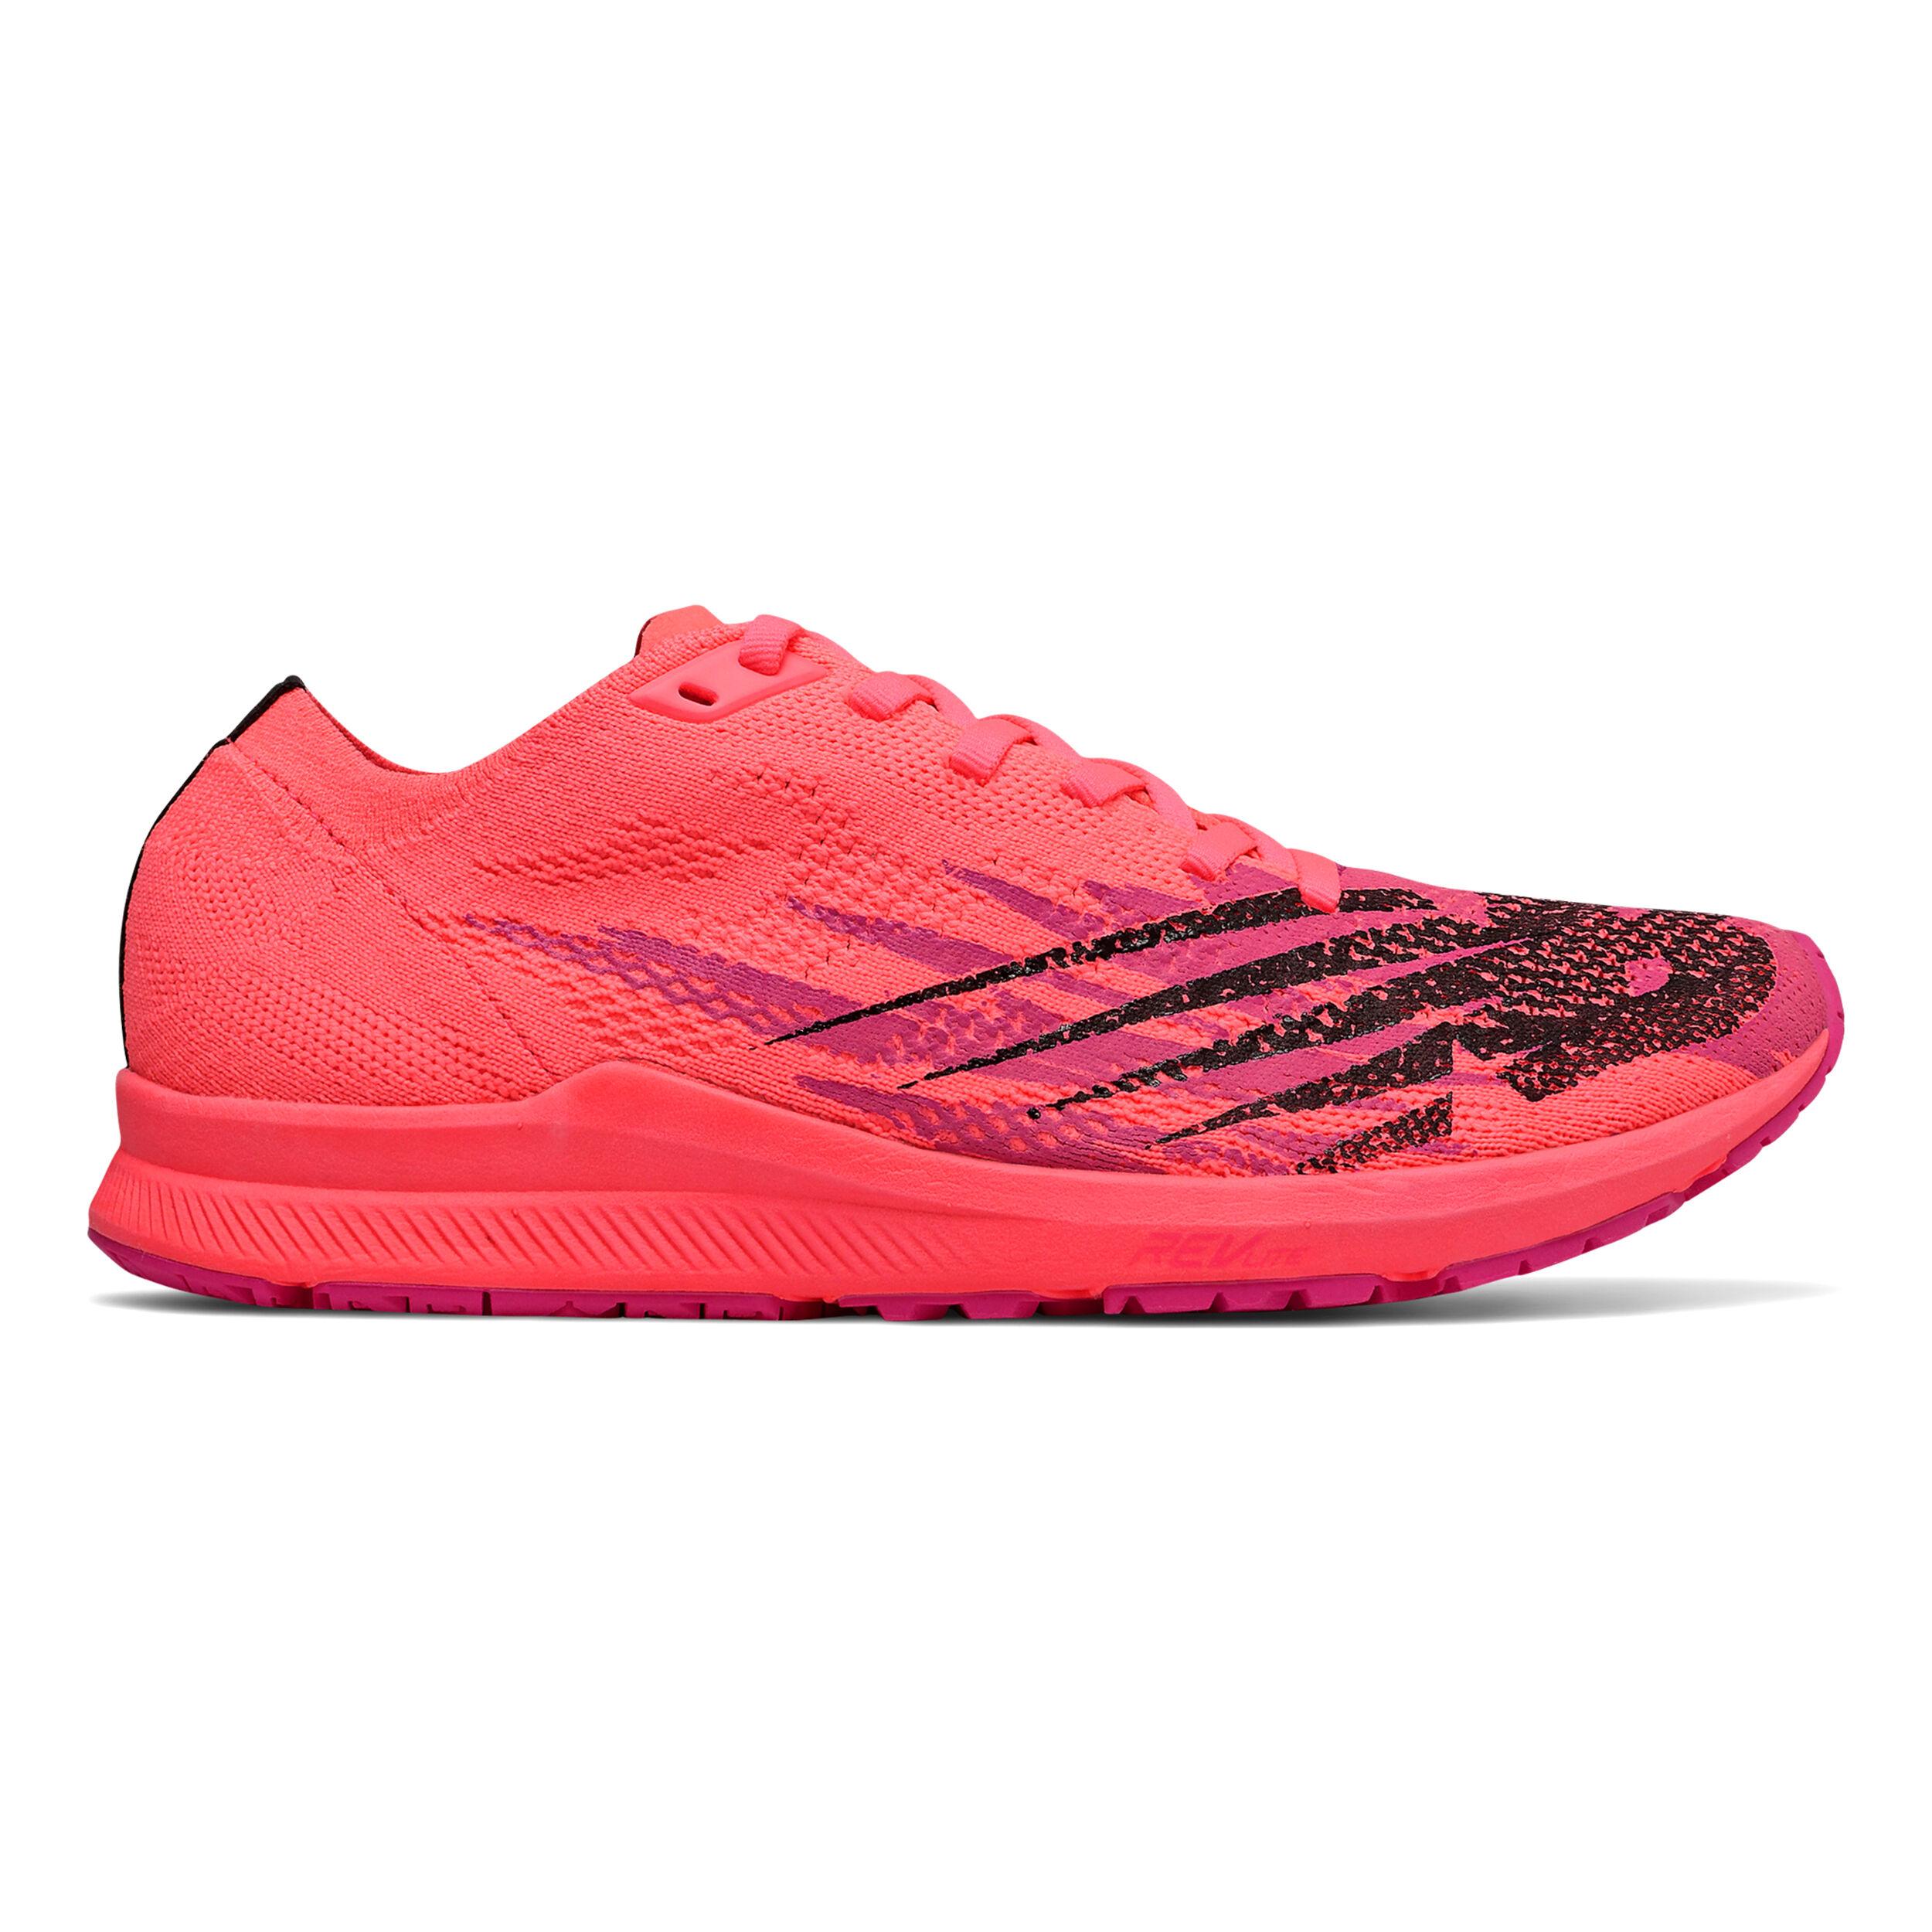 1500 V6 BOA Wettkampfschuh Damen Koralle, Pink